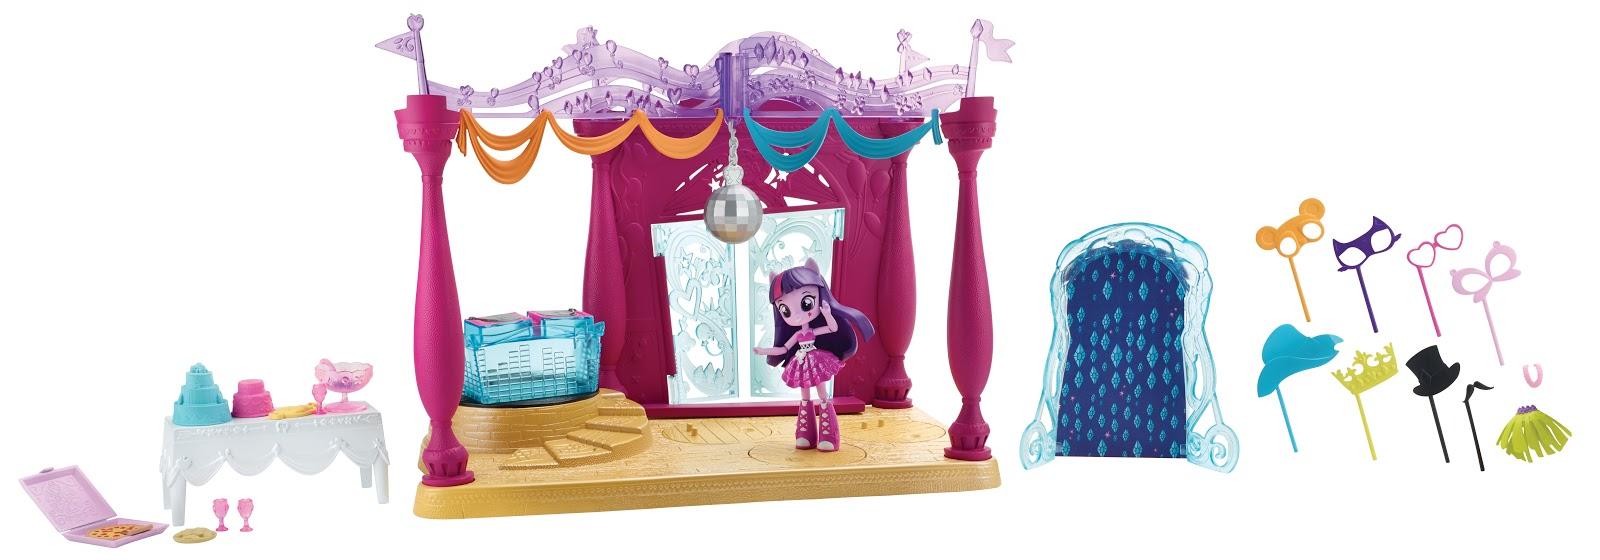 Amazing Equestria Girls Mini Dance Party Set